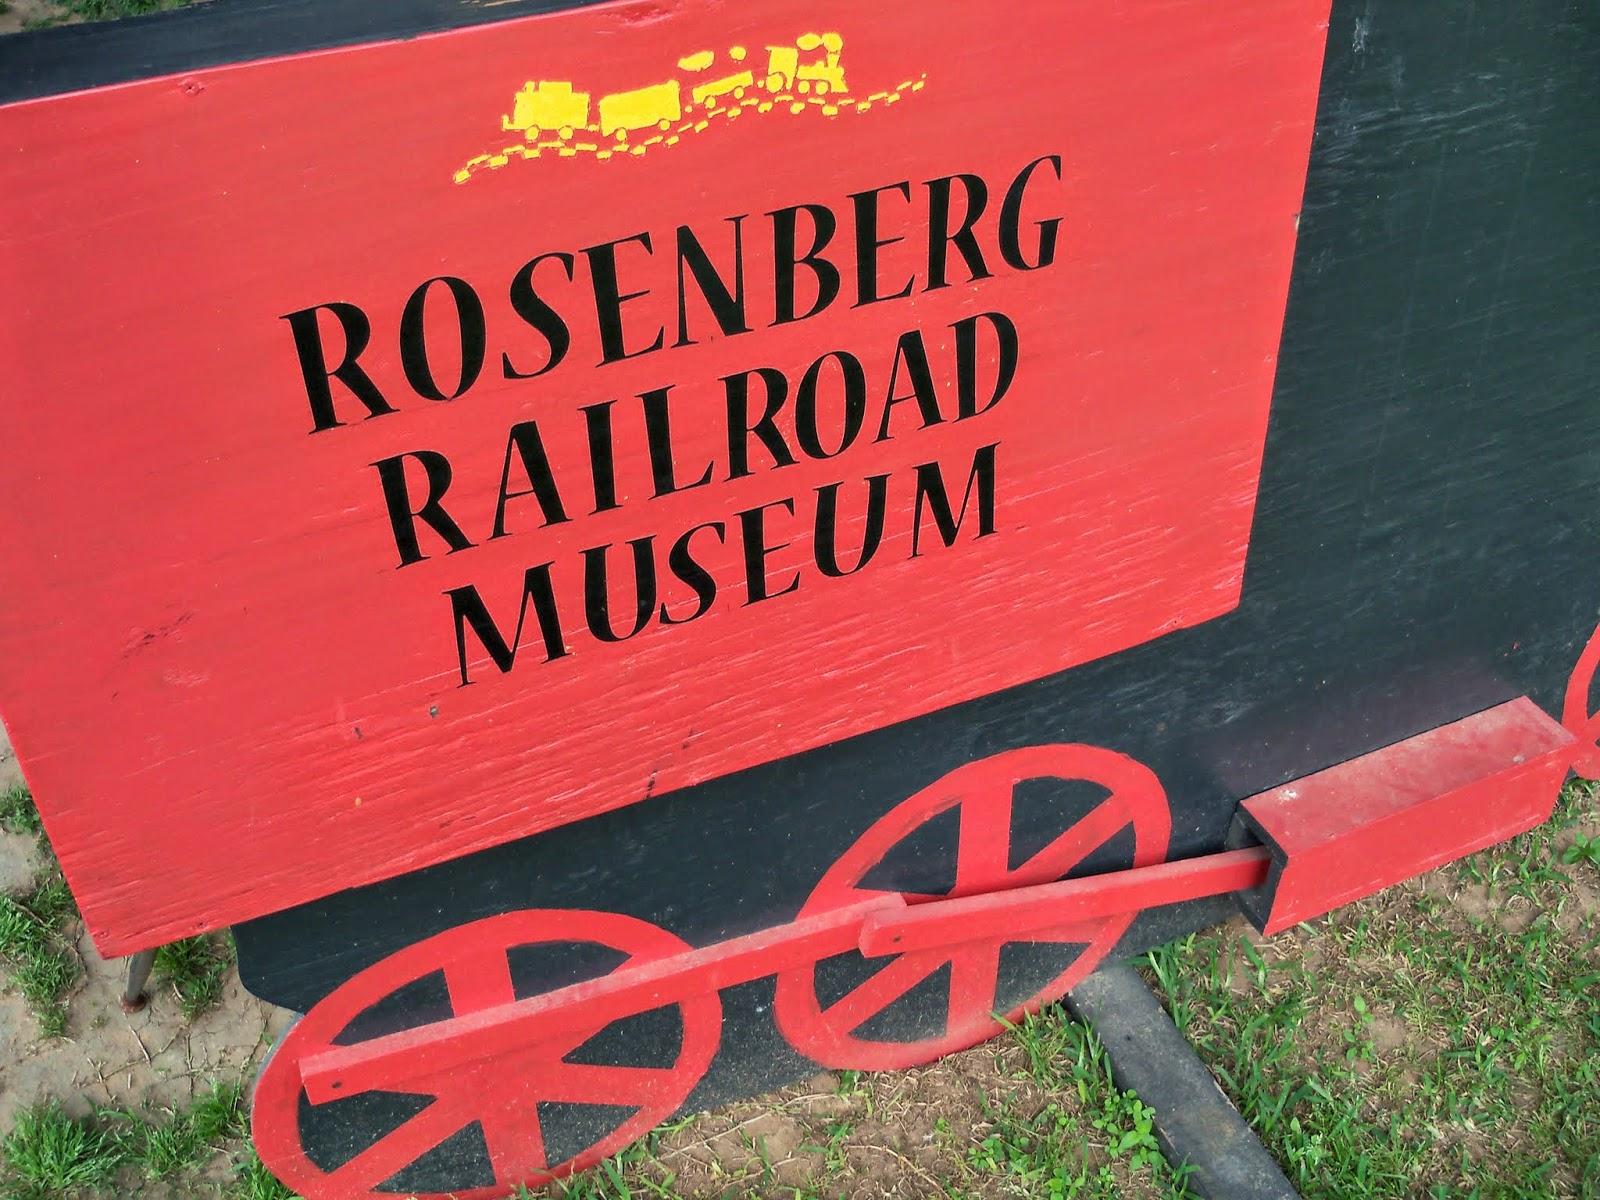 Rosenberg Railroad Museum - 116_1191.JPG